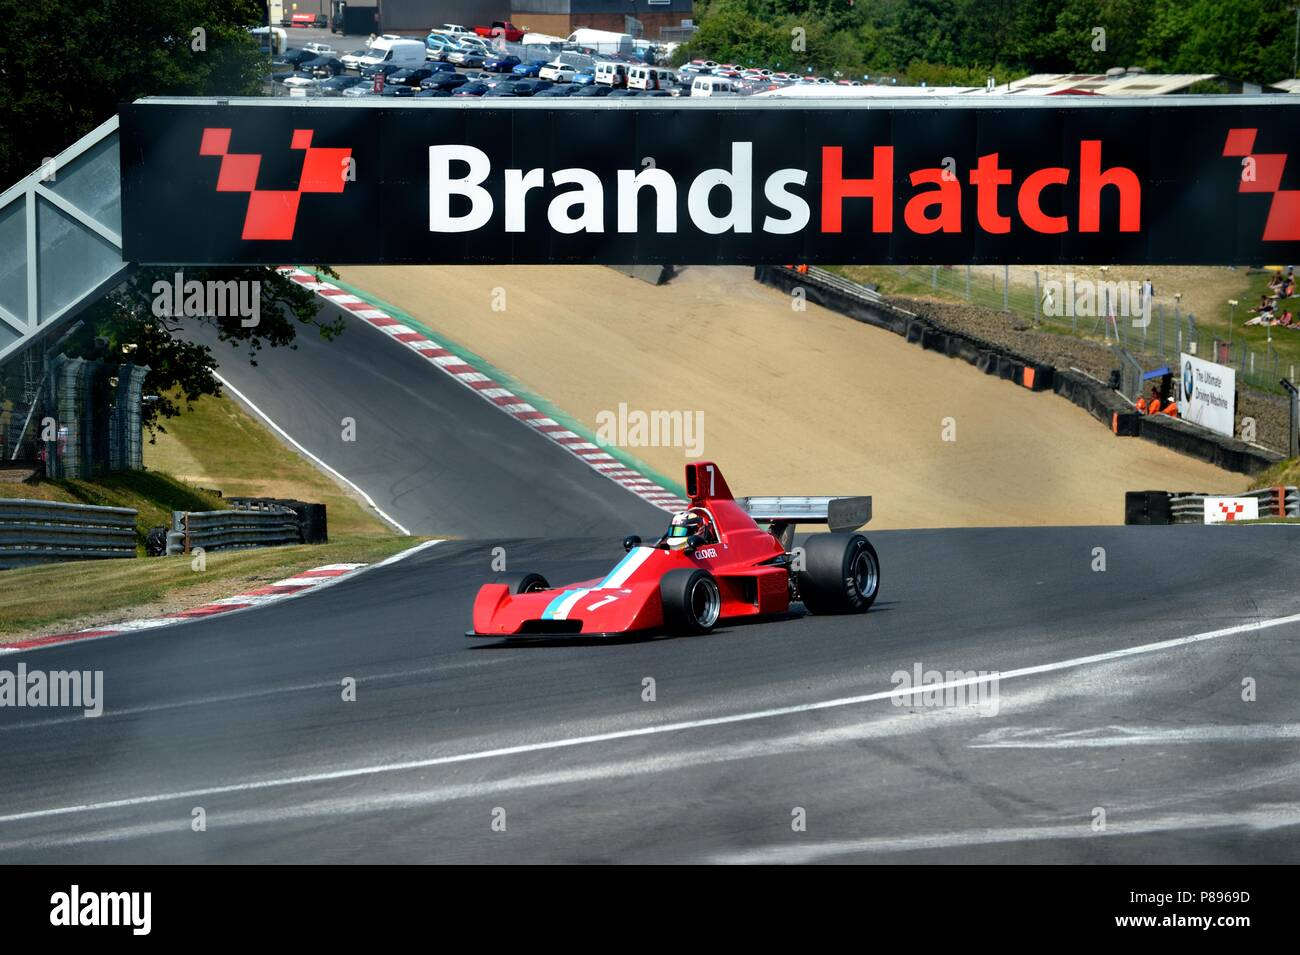 Brands Hatch car racing - Stock Image